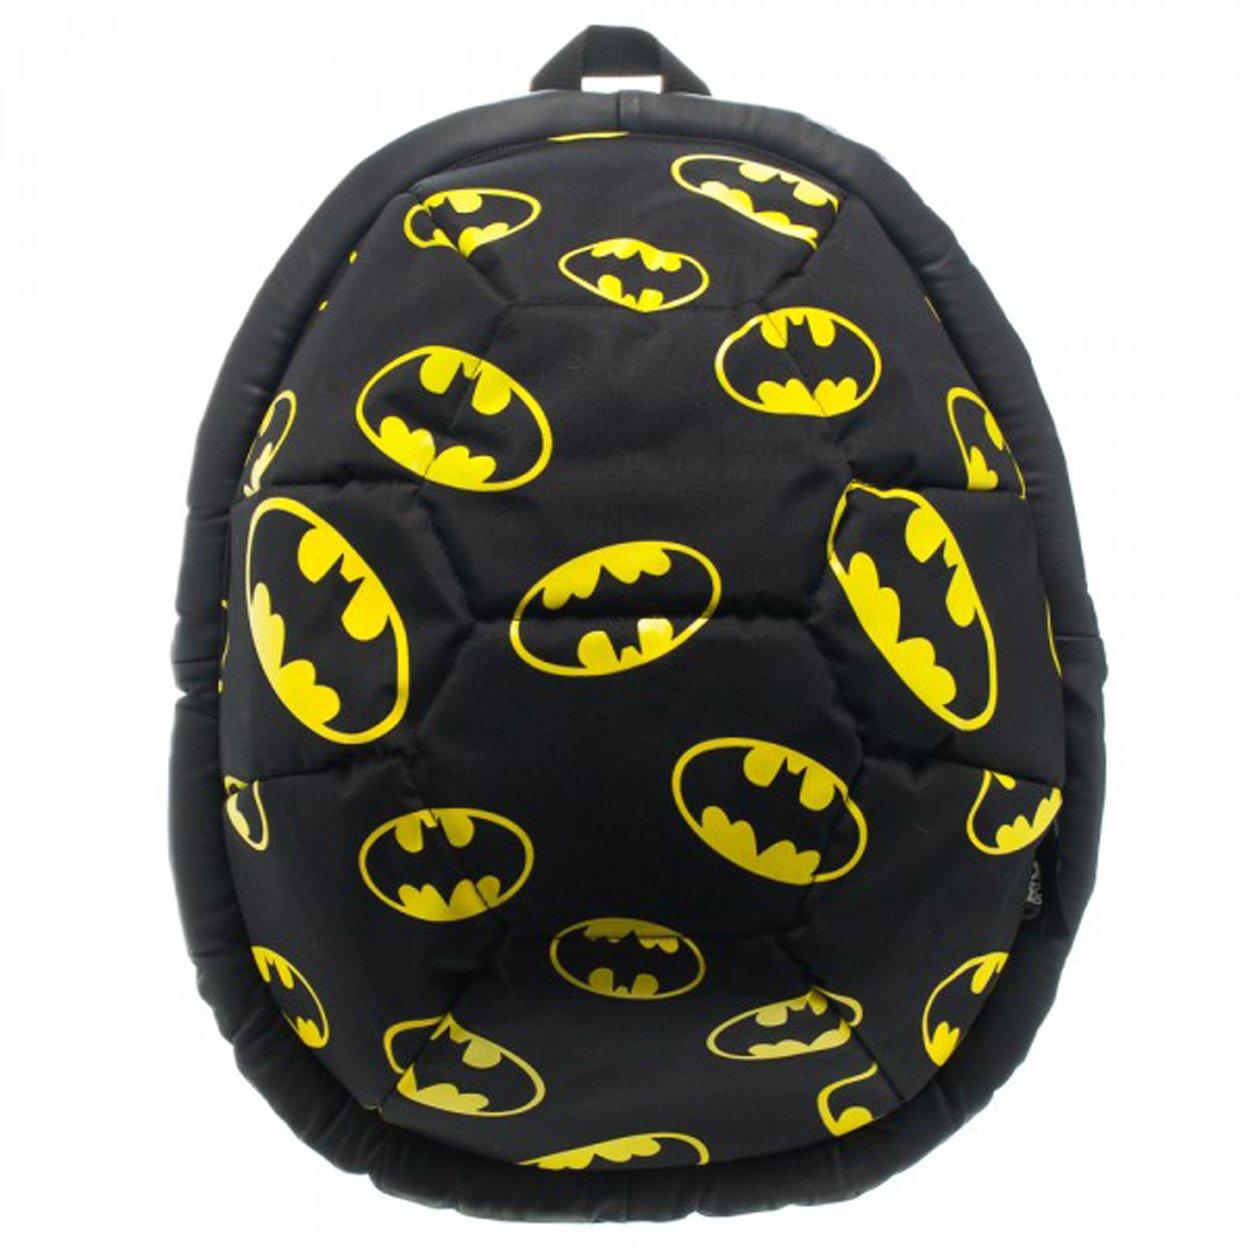 DC Comics Batuomo tutti Over Sublimated Print Biodome Backpack